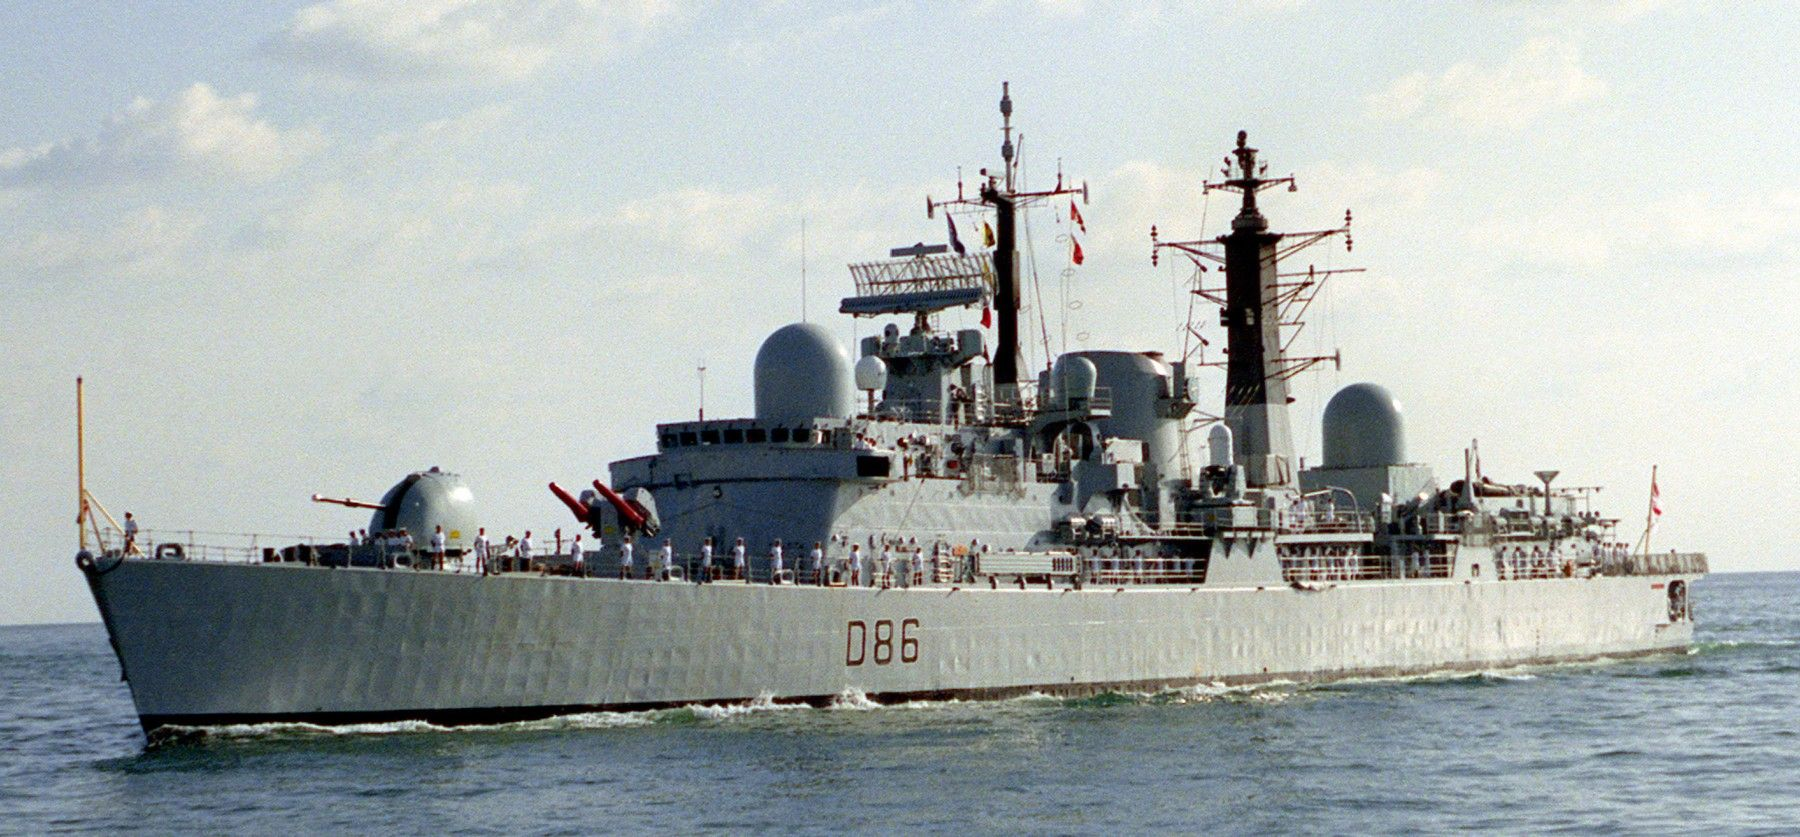 D86 Hms Birmingham Type Class Guided Missile Destroyer Sheffield Type 42 Class Batch 1 Builder Cammell La Royal Navy City Of Birmingham Birmingham